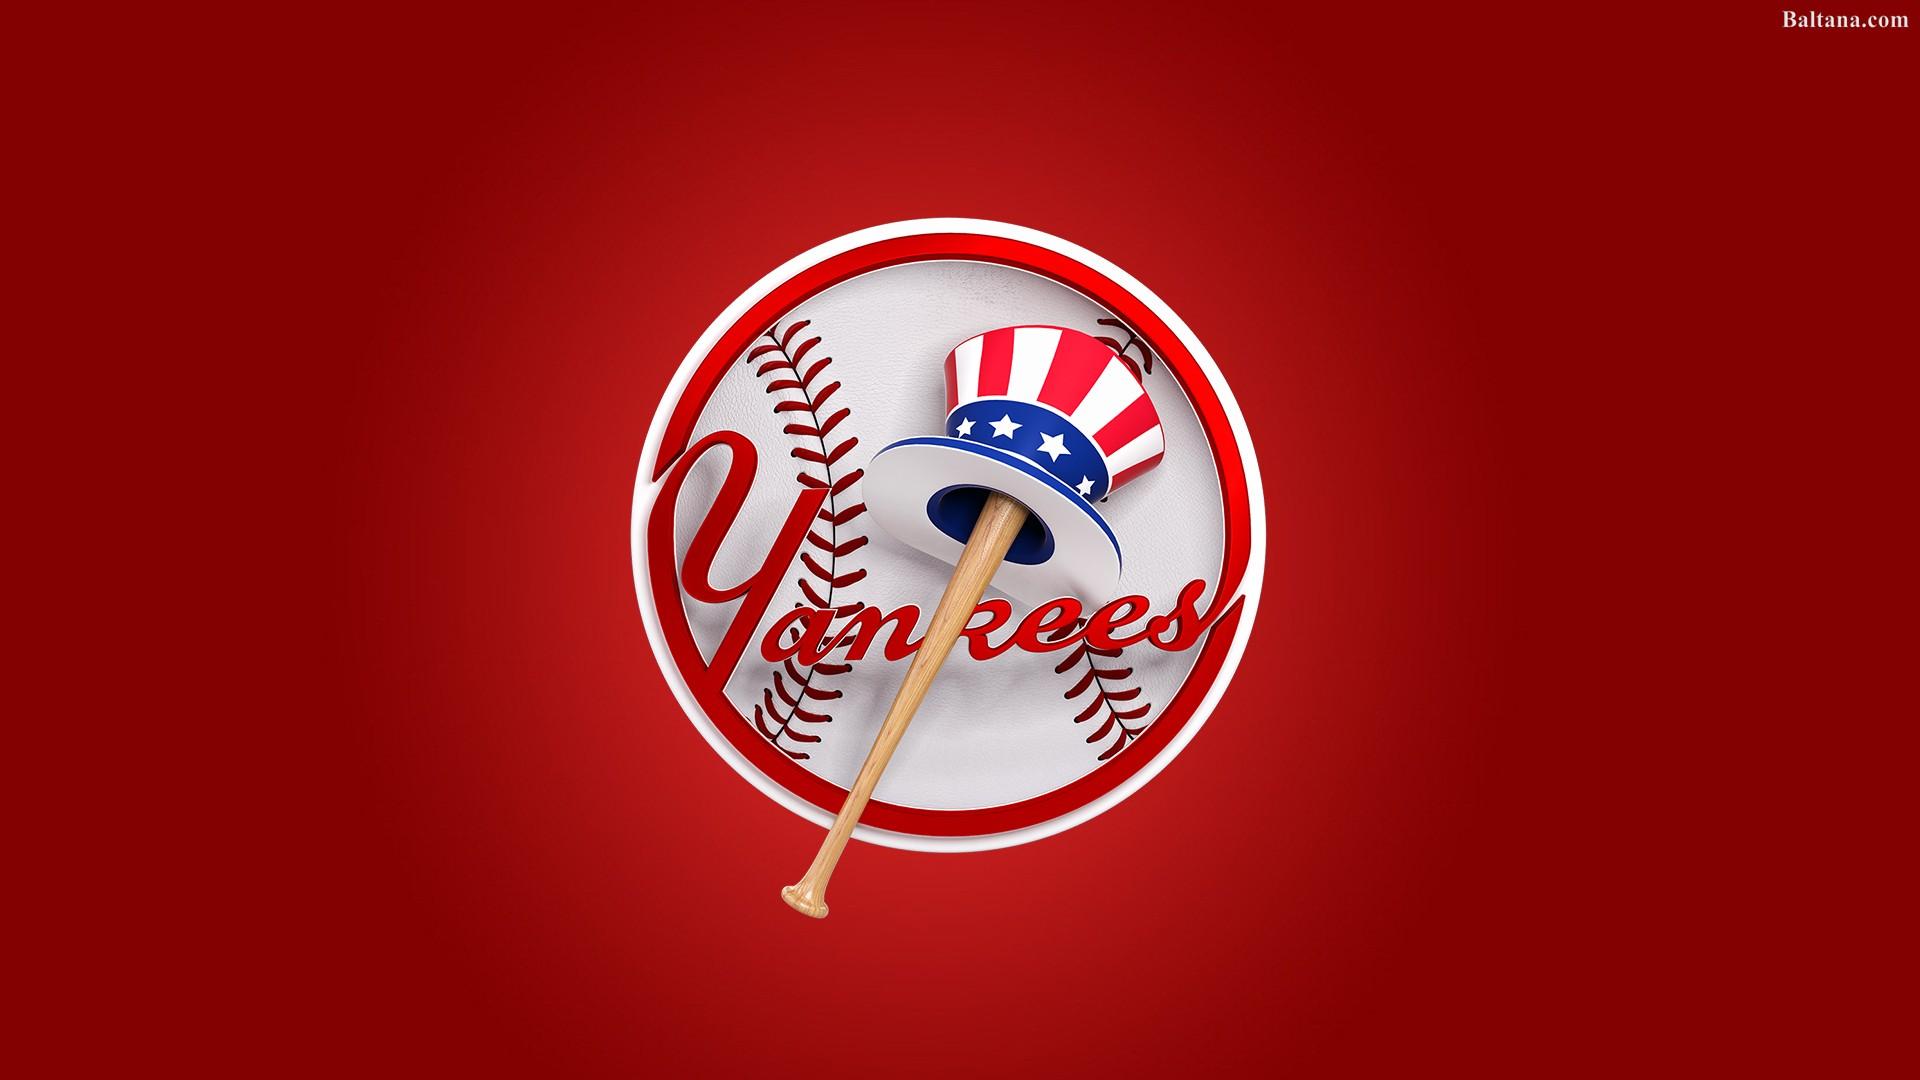 New York Yankees Wallpaper - New York Yankees Iphone , HD Wallpaper & Backgrounds